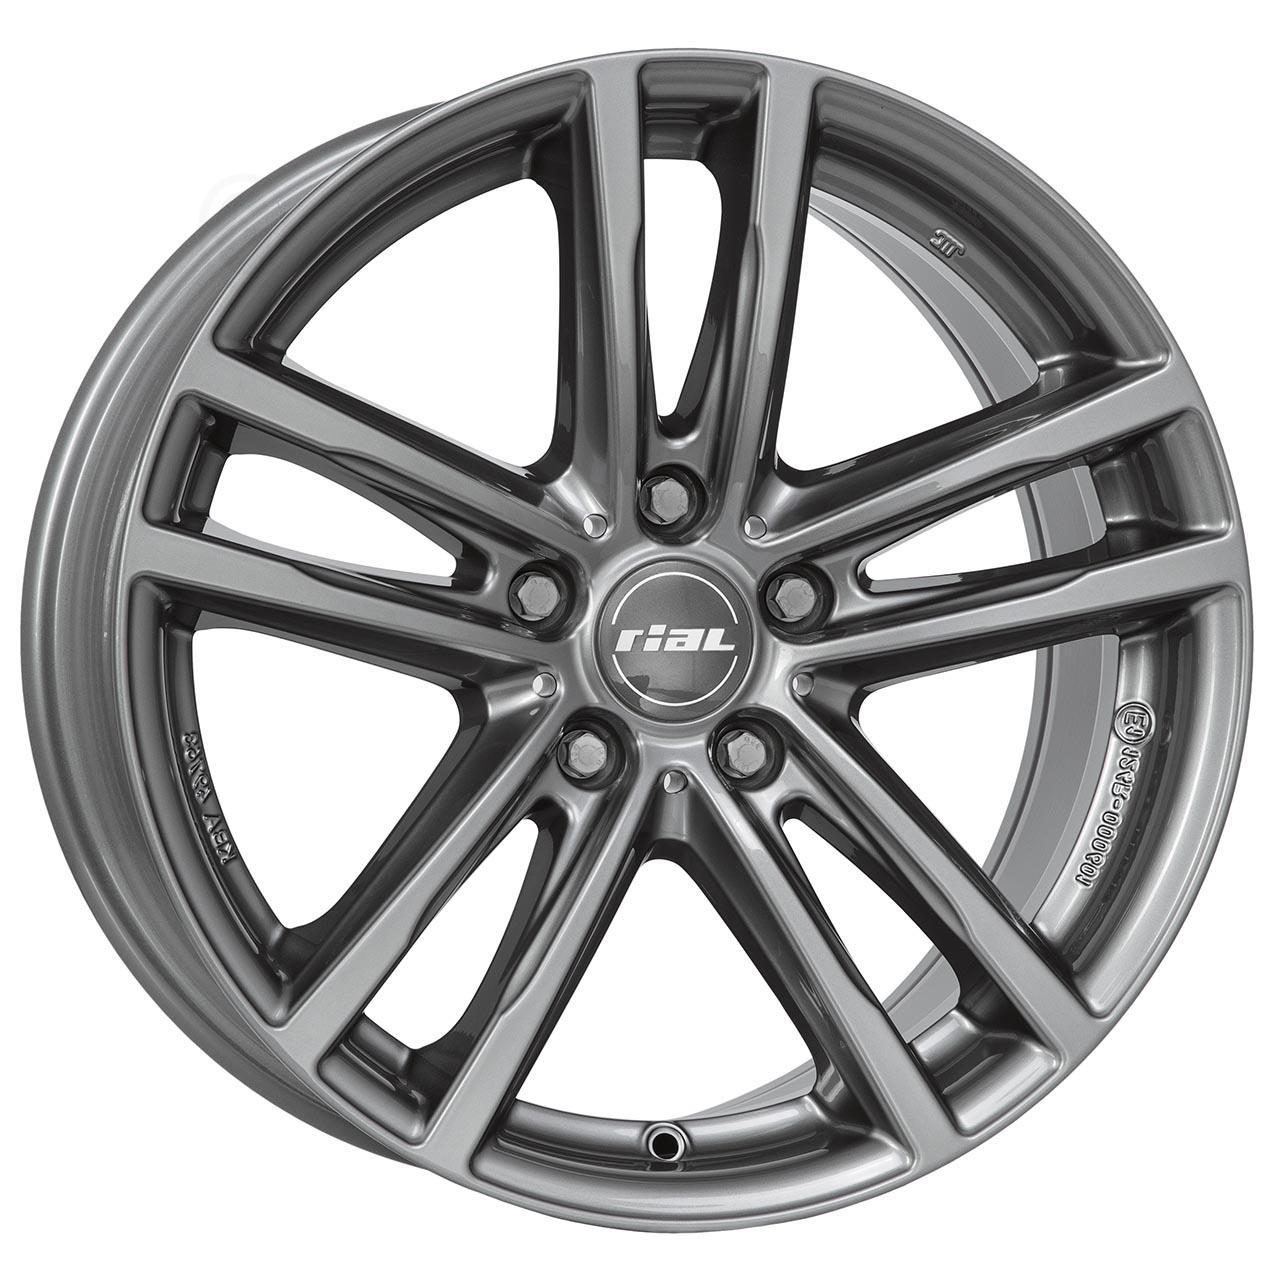 Rial X10 Metal grey 7.5x17 5x112 ET40